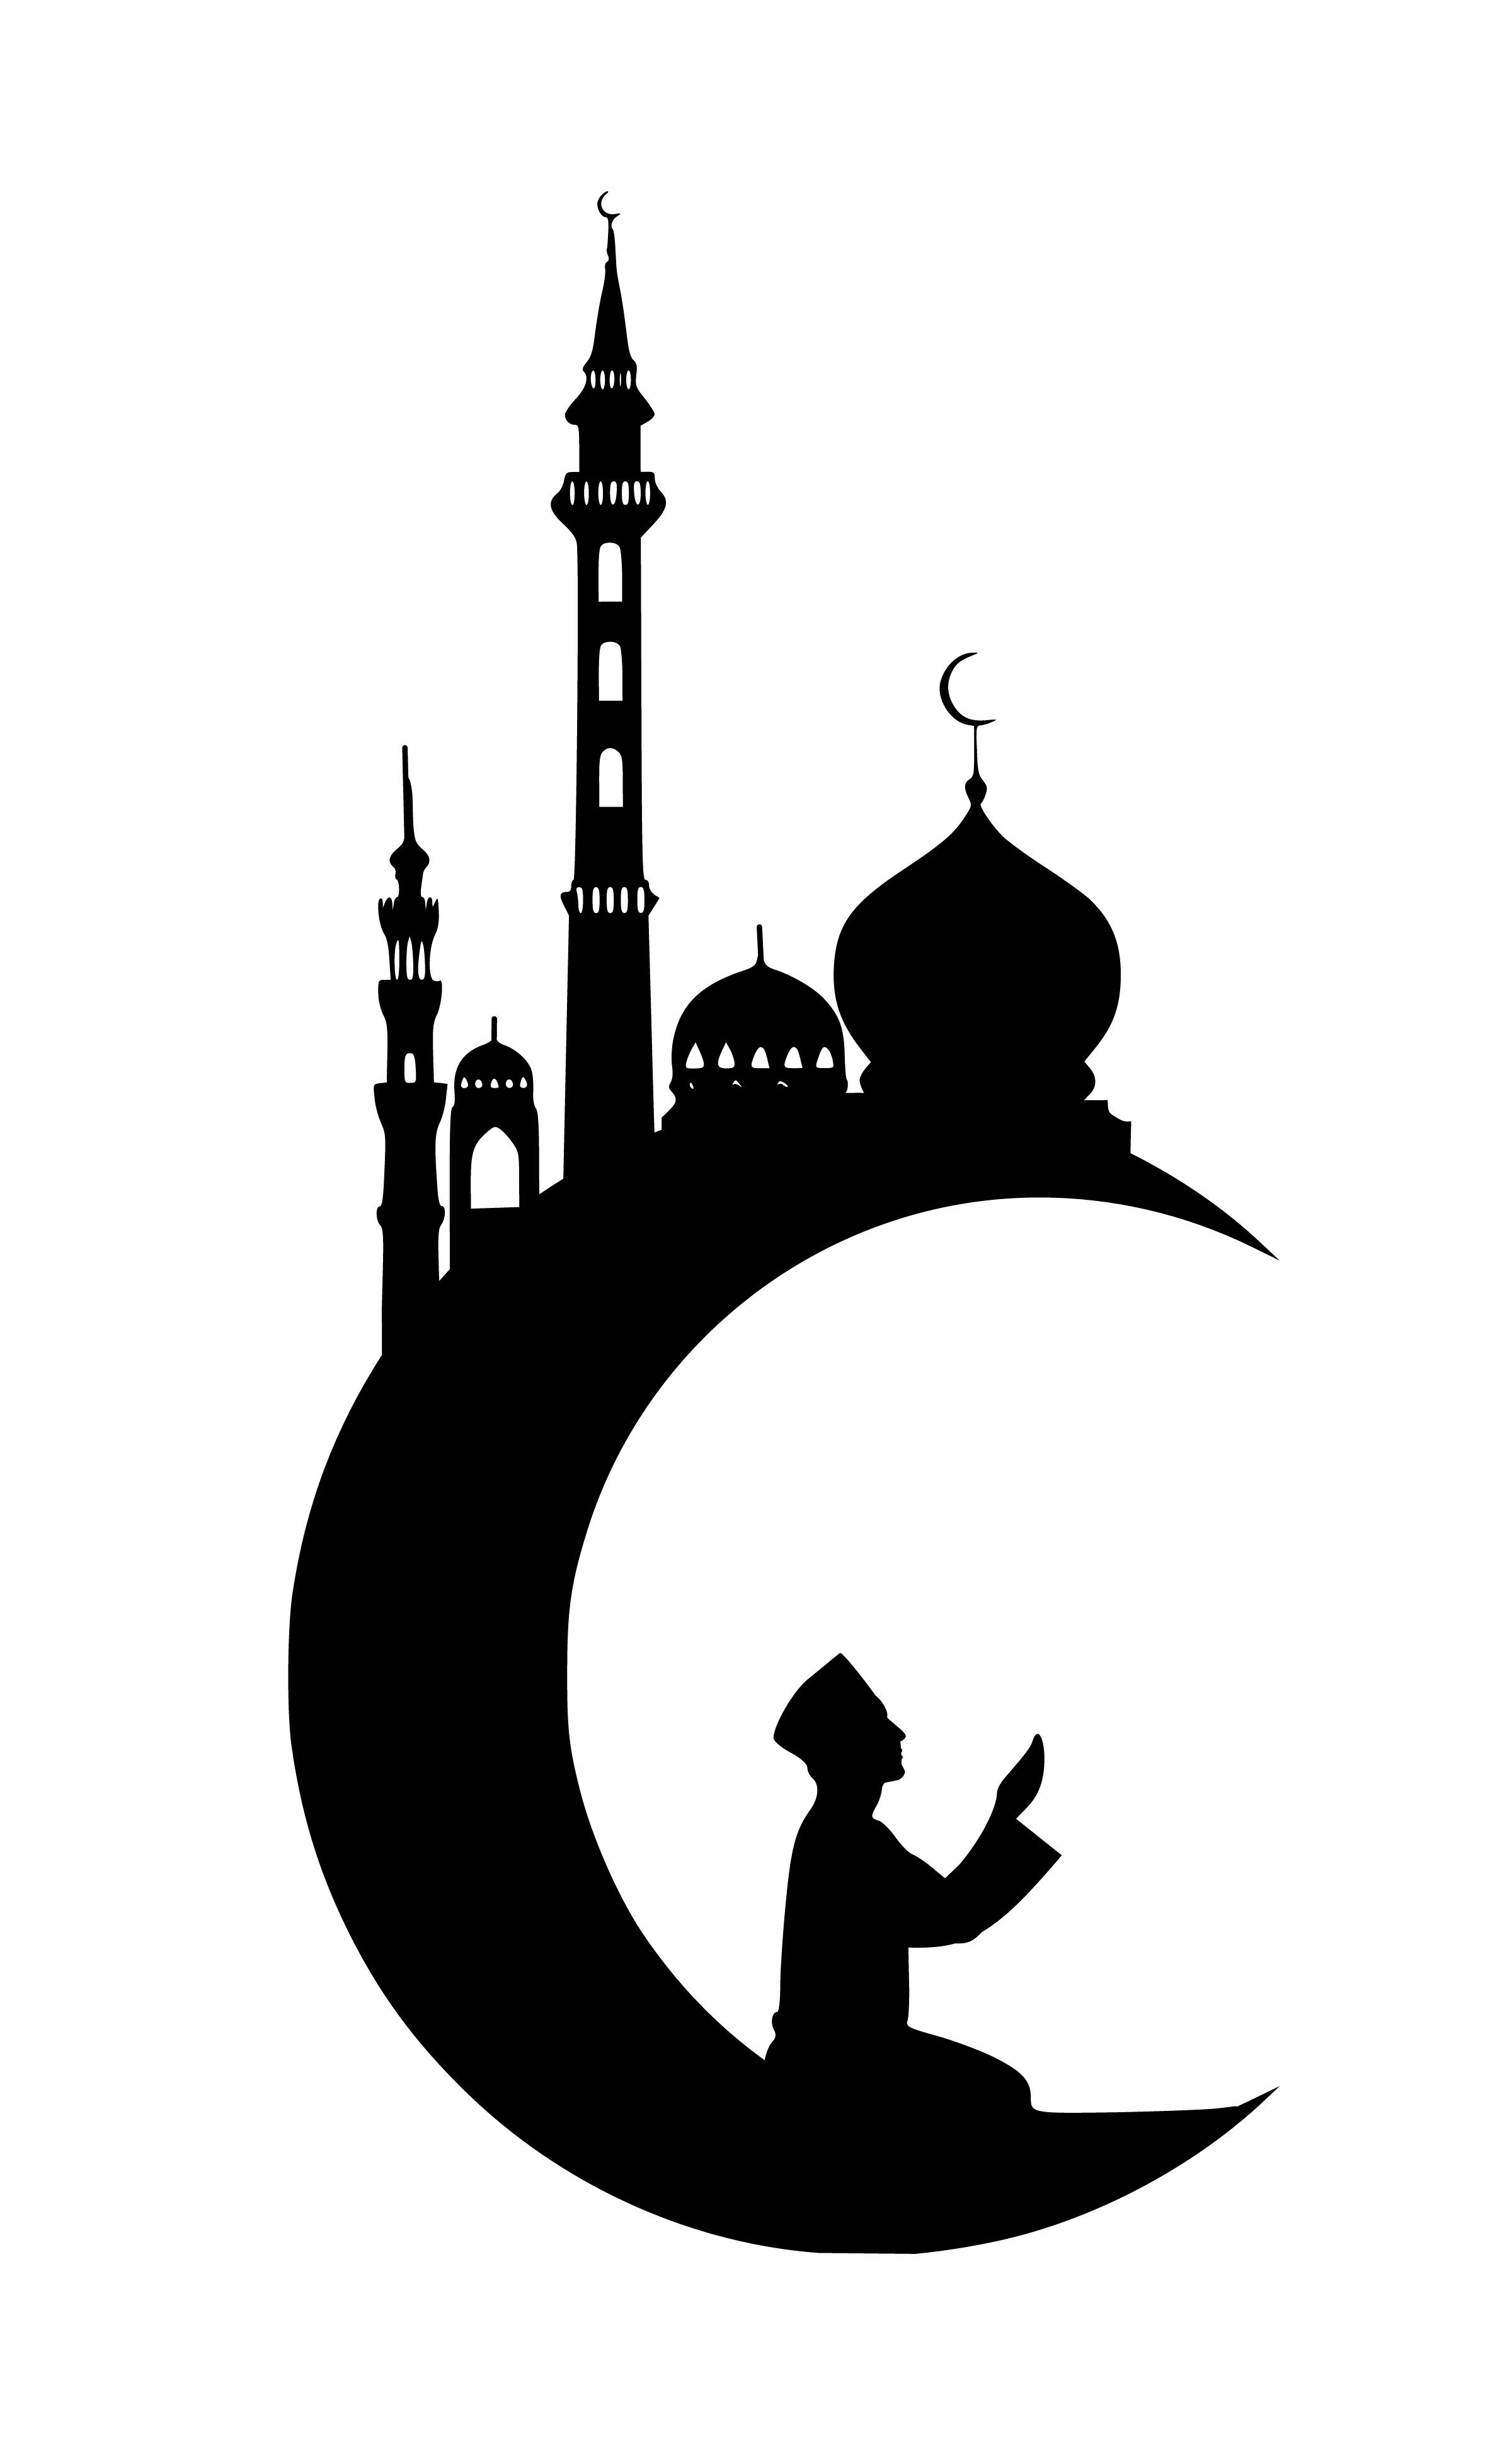 Free Images : ramadan, kareem, moon, masjid, eid, arabic, night